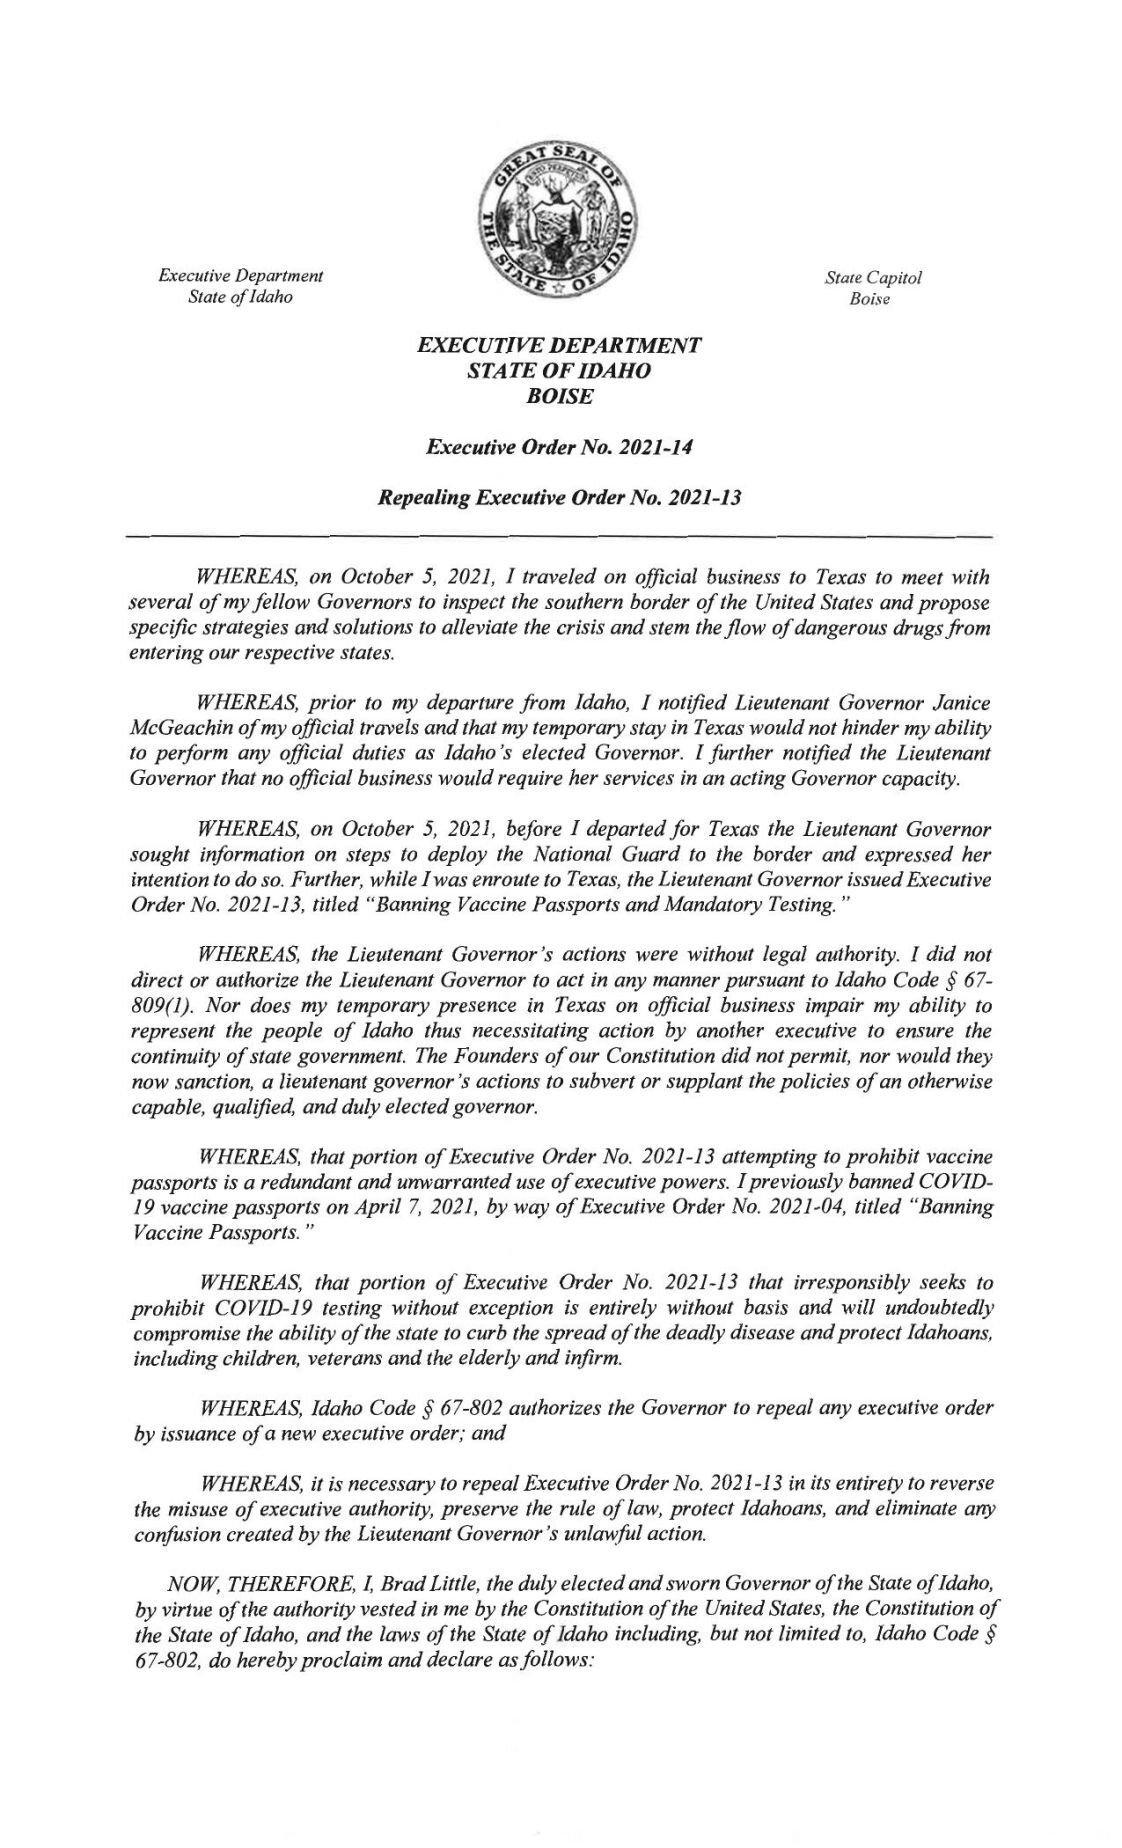 Gov. Brad Little's Executive Order 2021-14